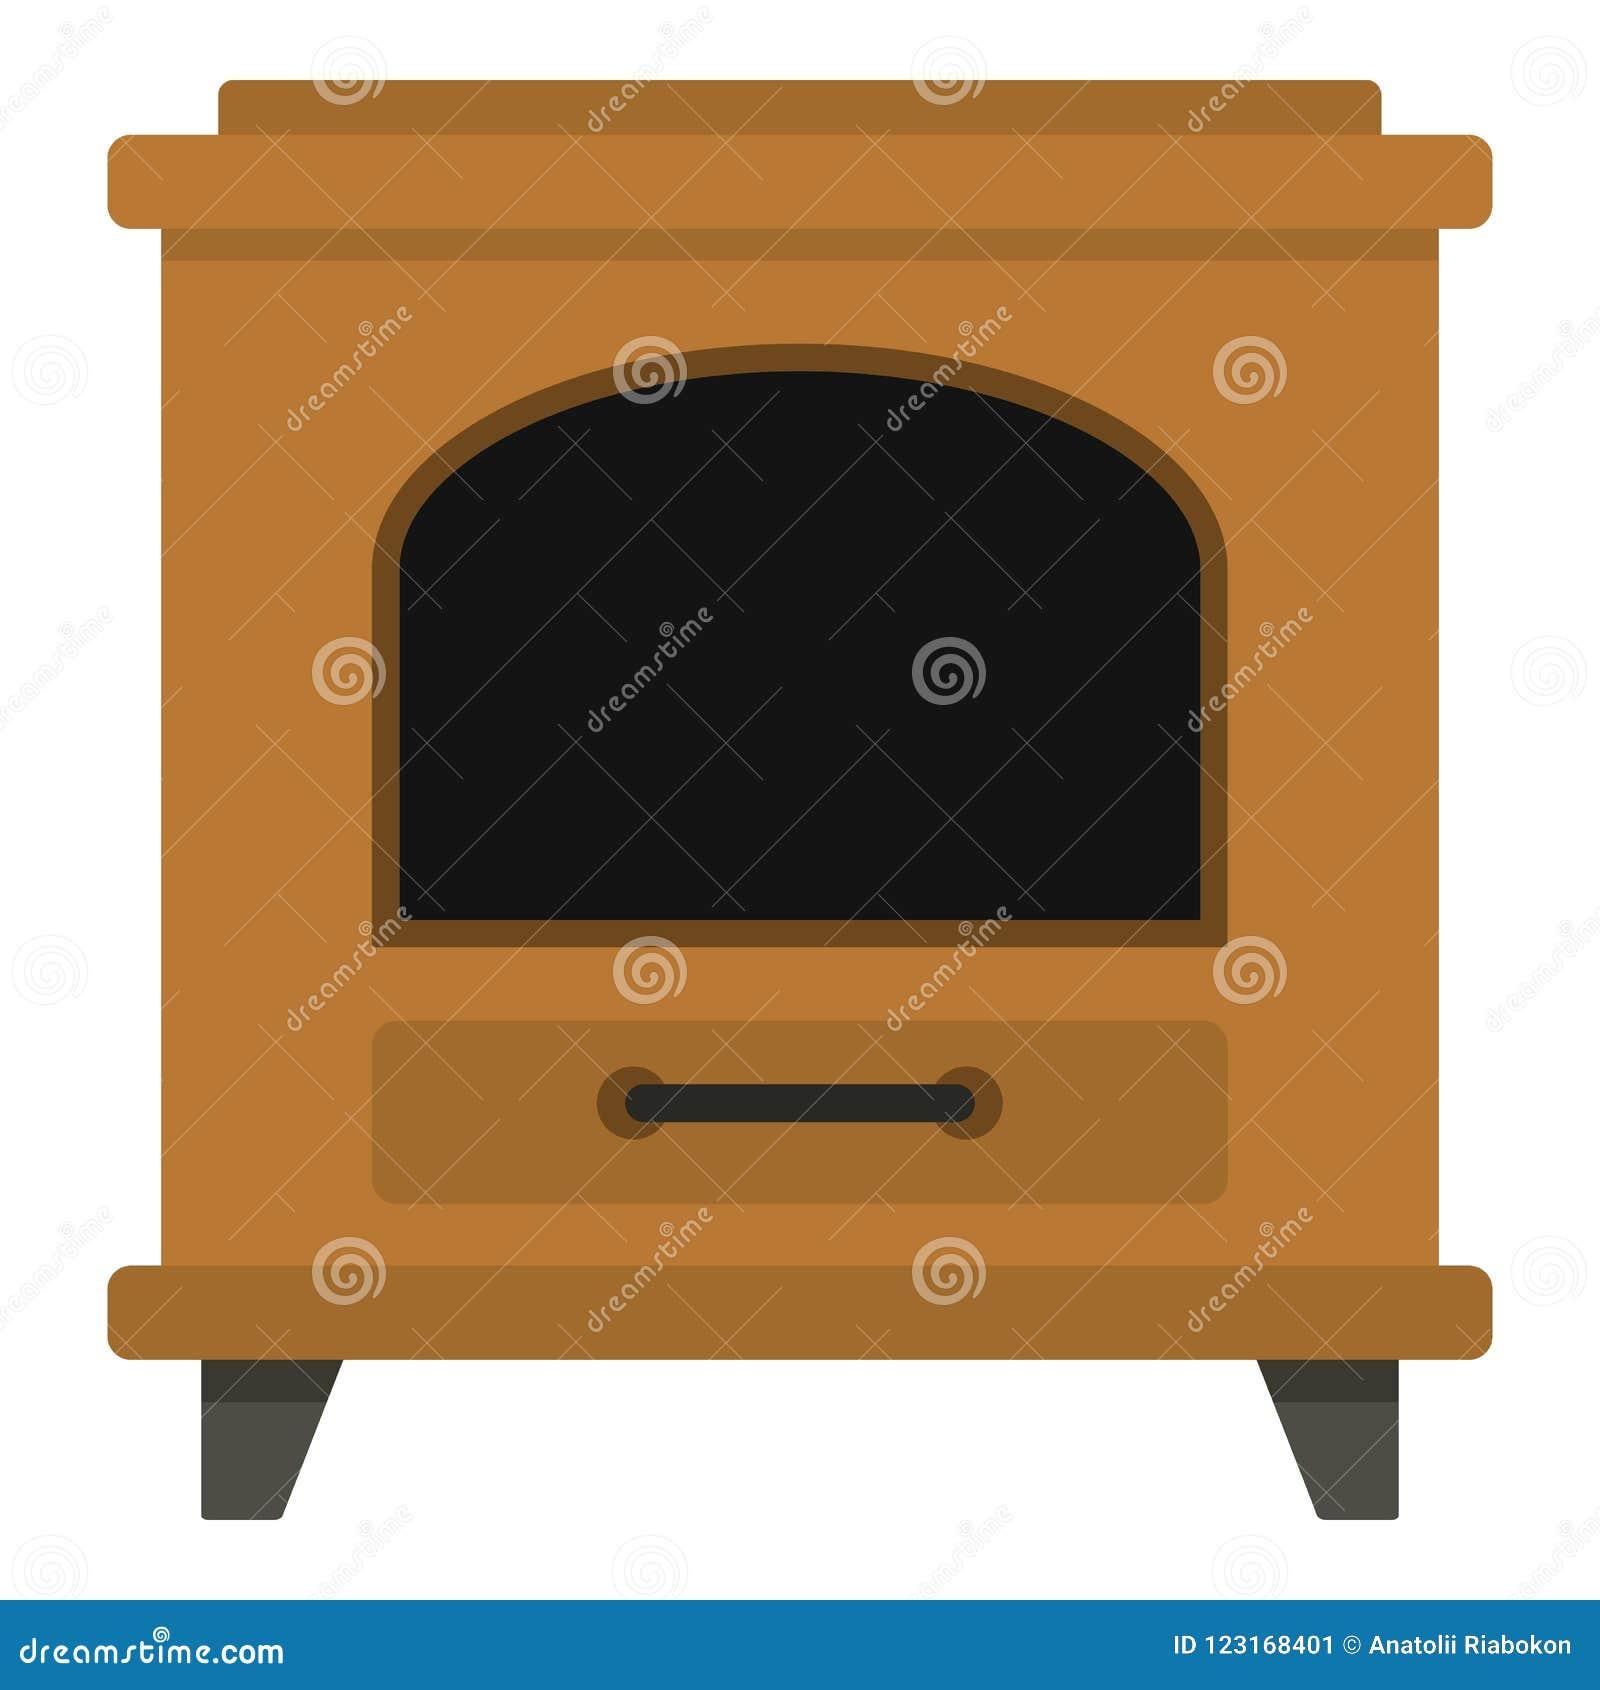 Icono antiguo del horno, estilo de la historieta